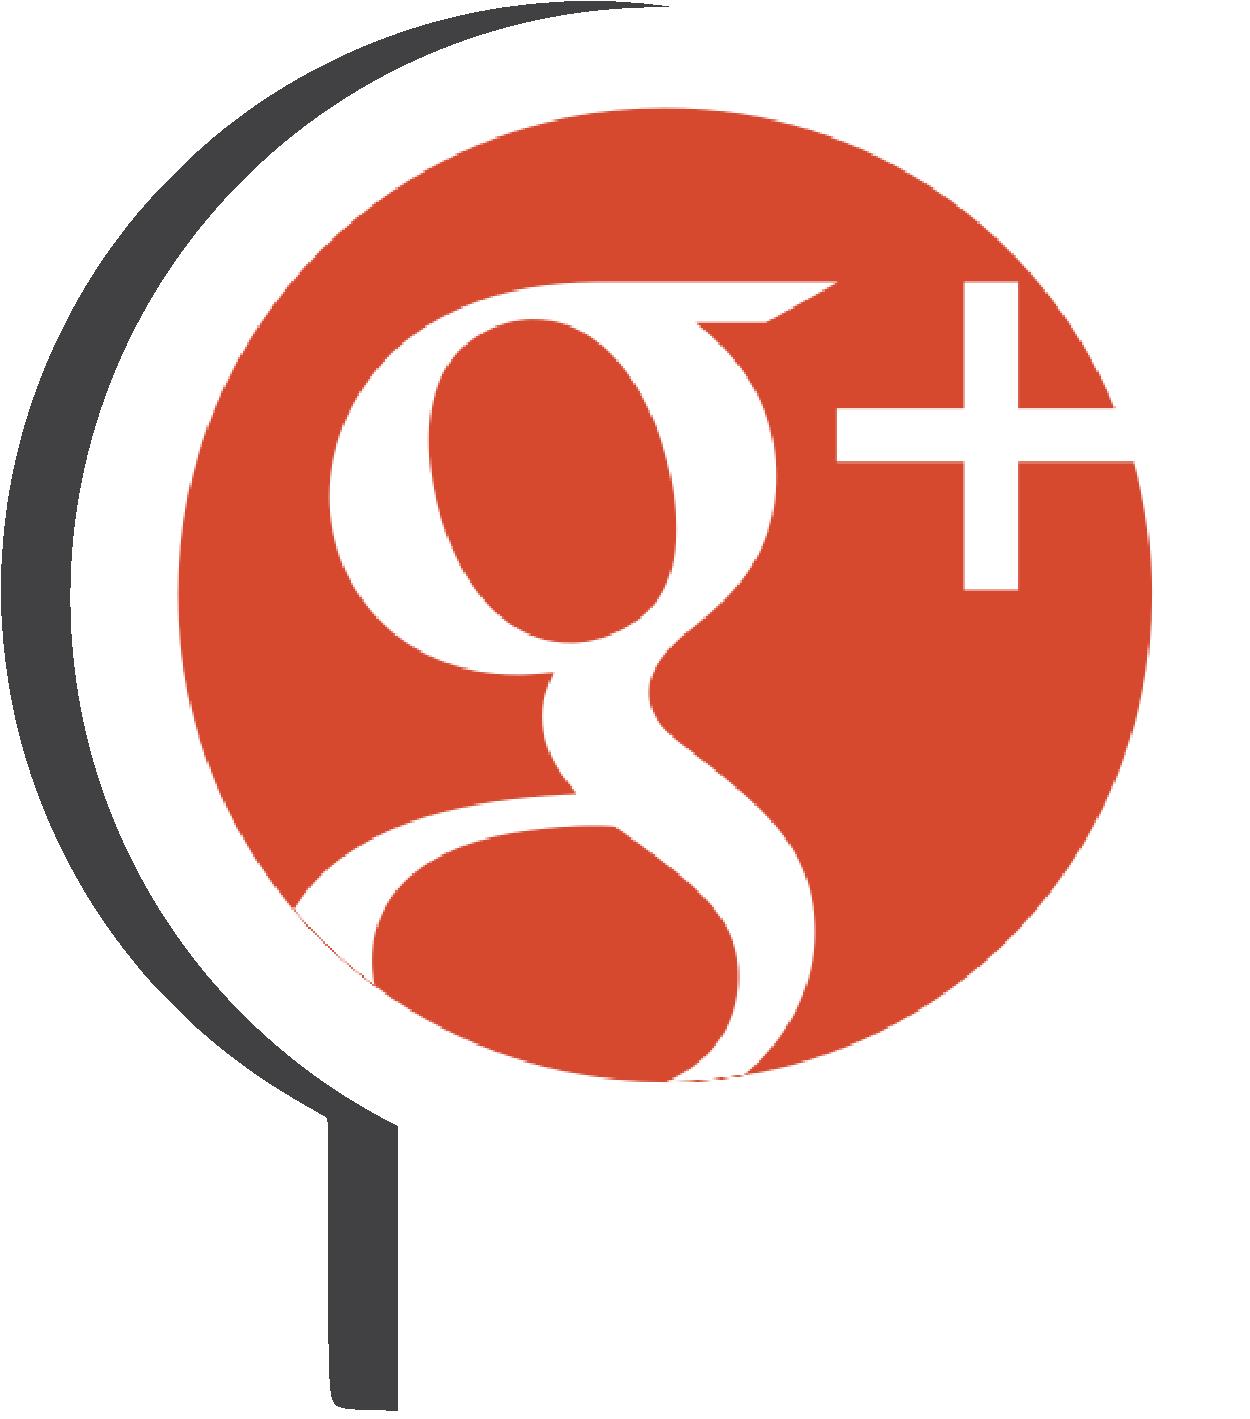 Perfil de Avícola Rías Baixas en Google Plus